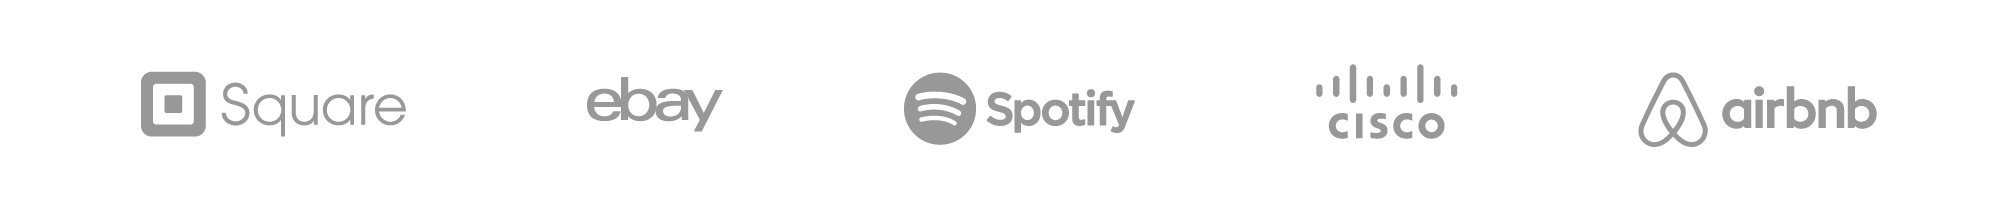 Clientes de JIRA: Square, Ebay, Spotify, Cisco, Airbnb